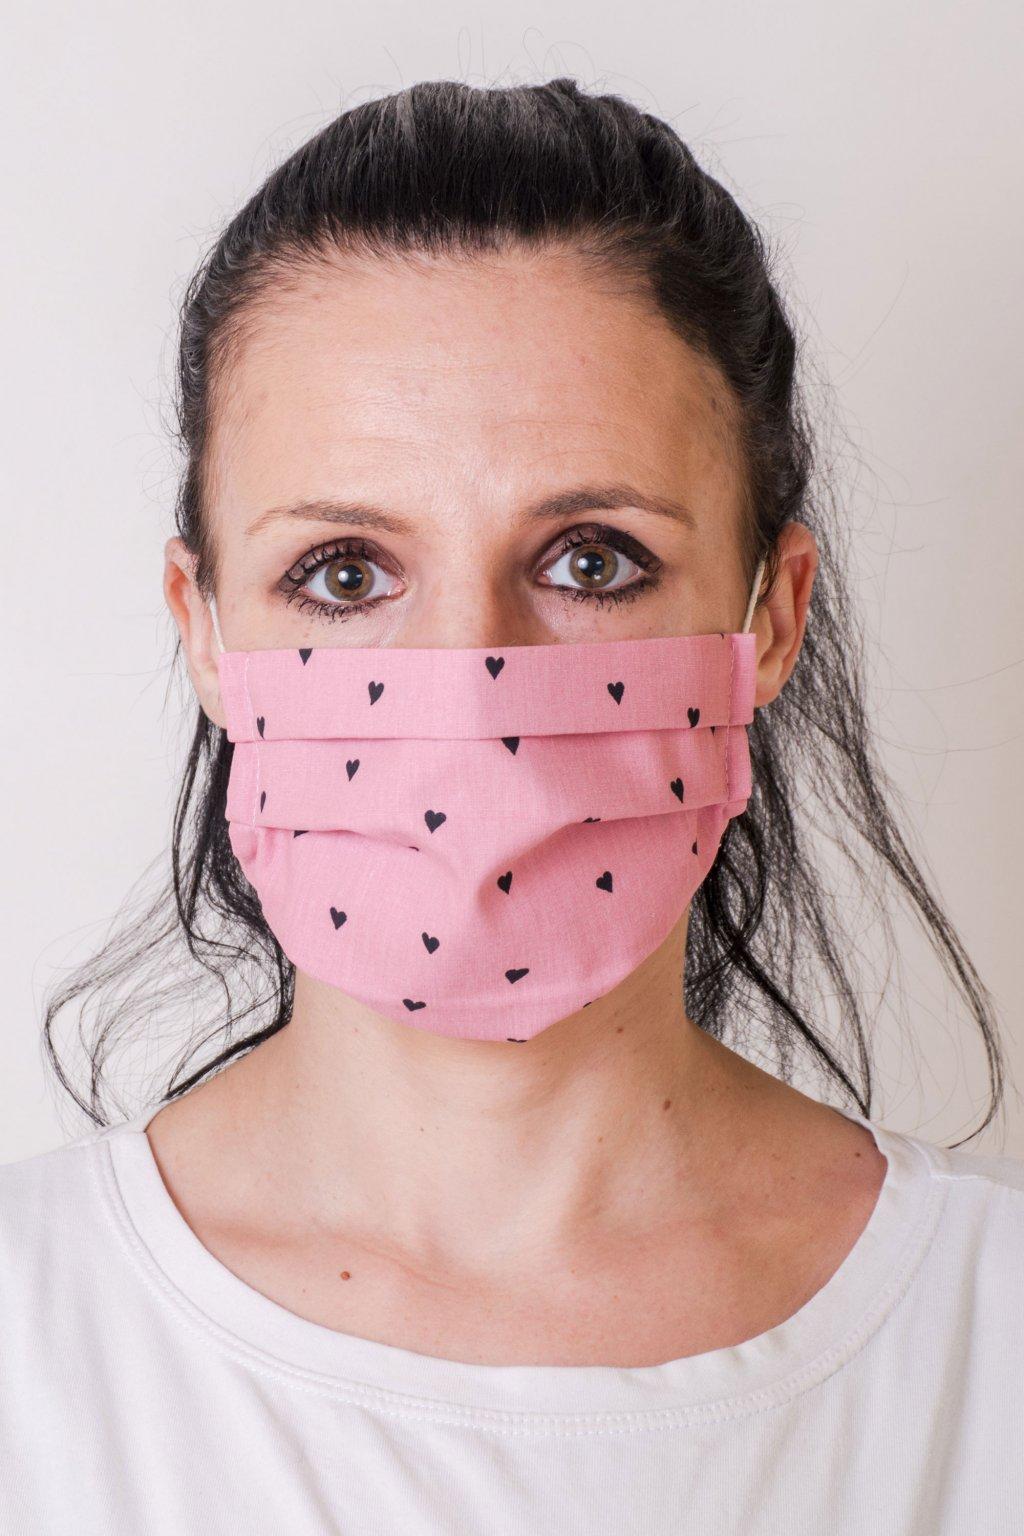 Dámská bavlněná rouška na ústa a nos dvouvrstvá skládaná s oušky z gumičky, 791-51026, Růžová